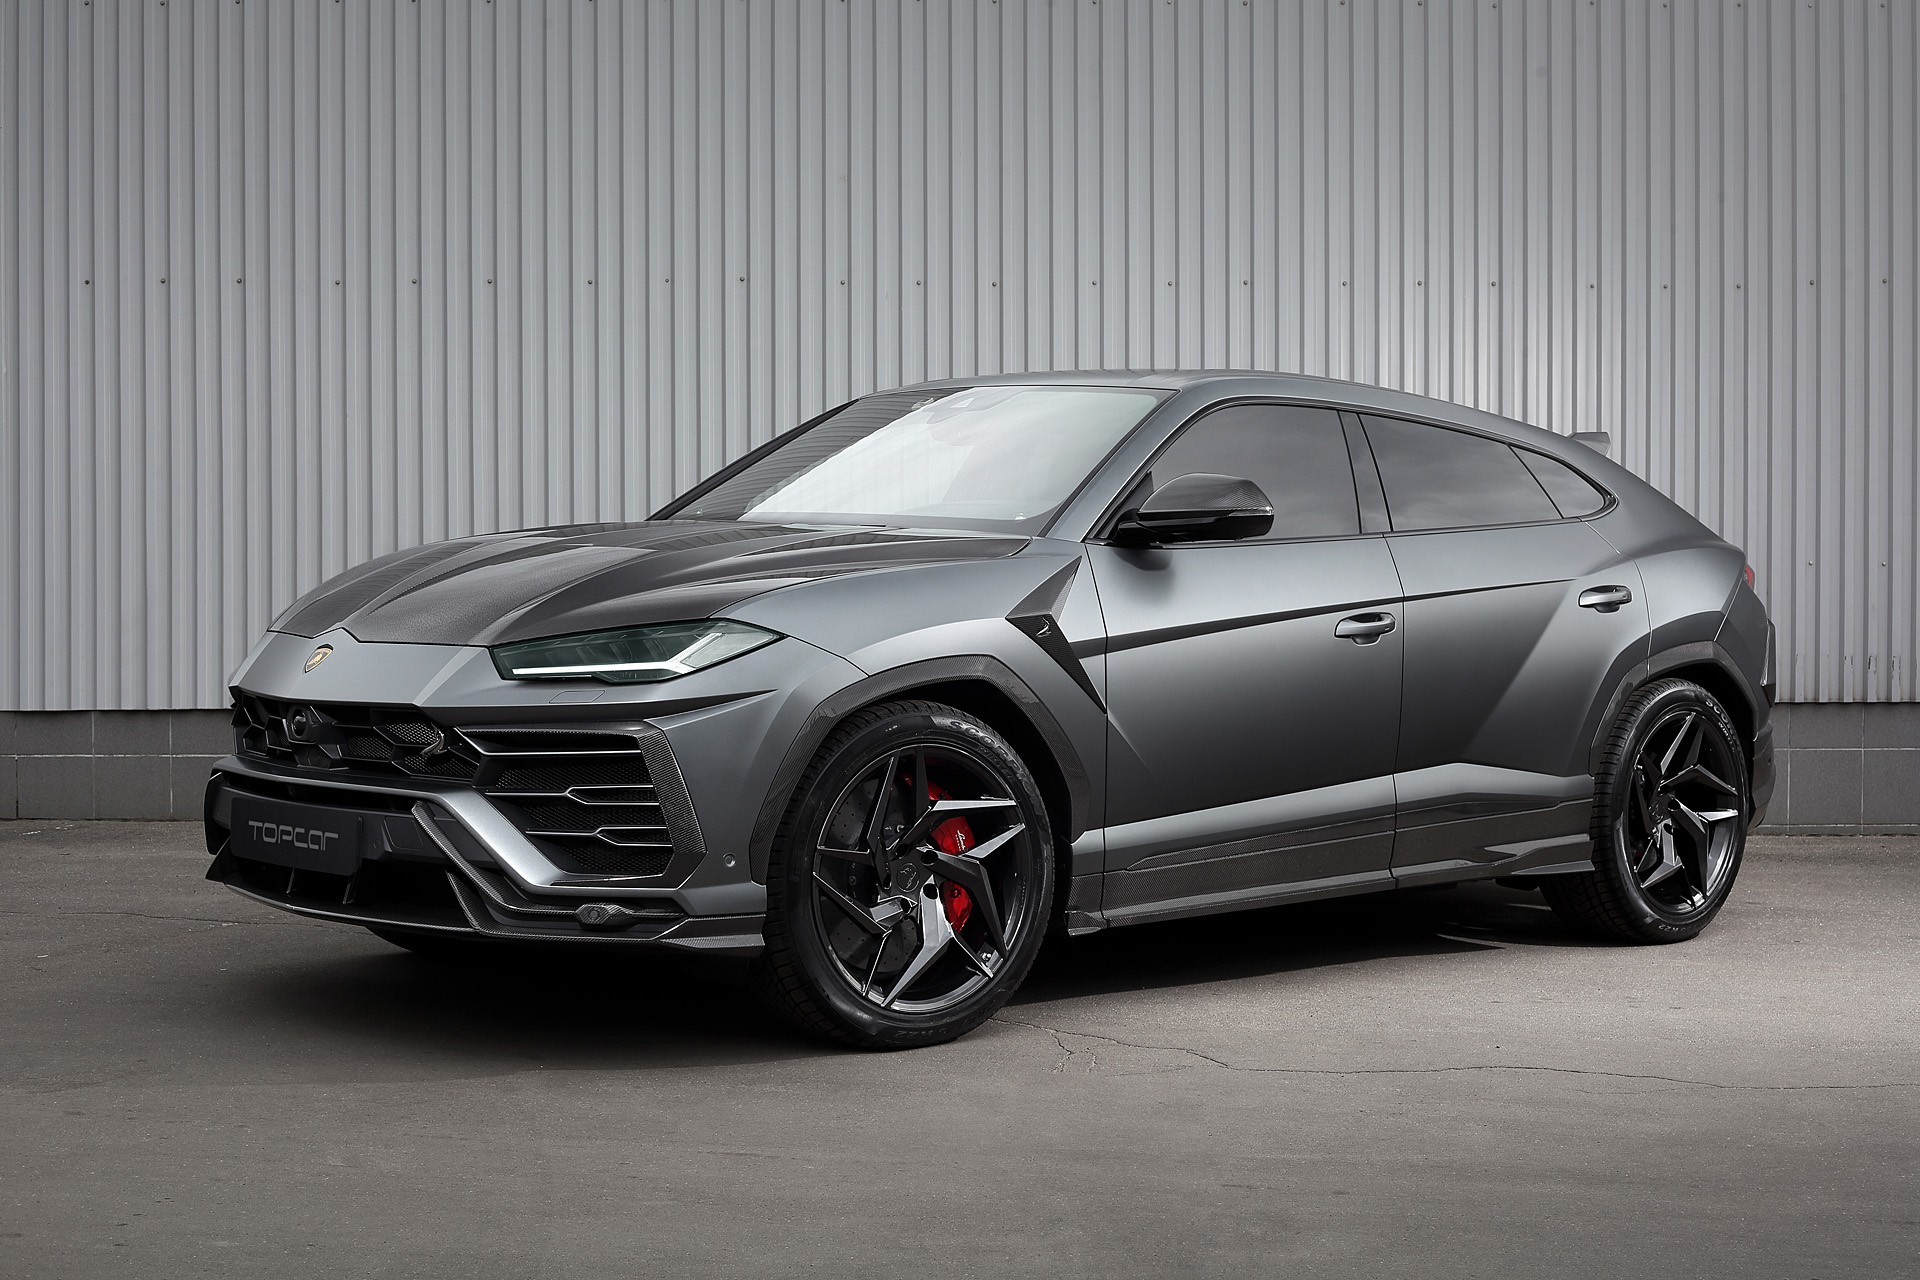 Our Newbie Lamborghini Urus In Matte Grey Color With The Original Carbon Package From Lamborghini Topcar